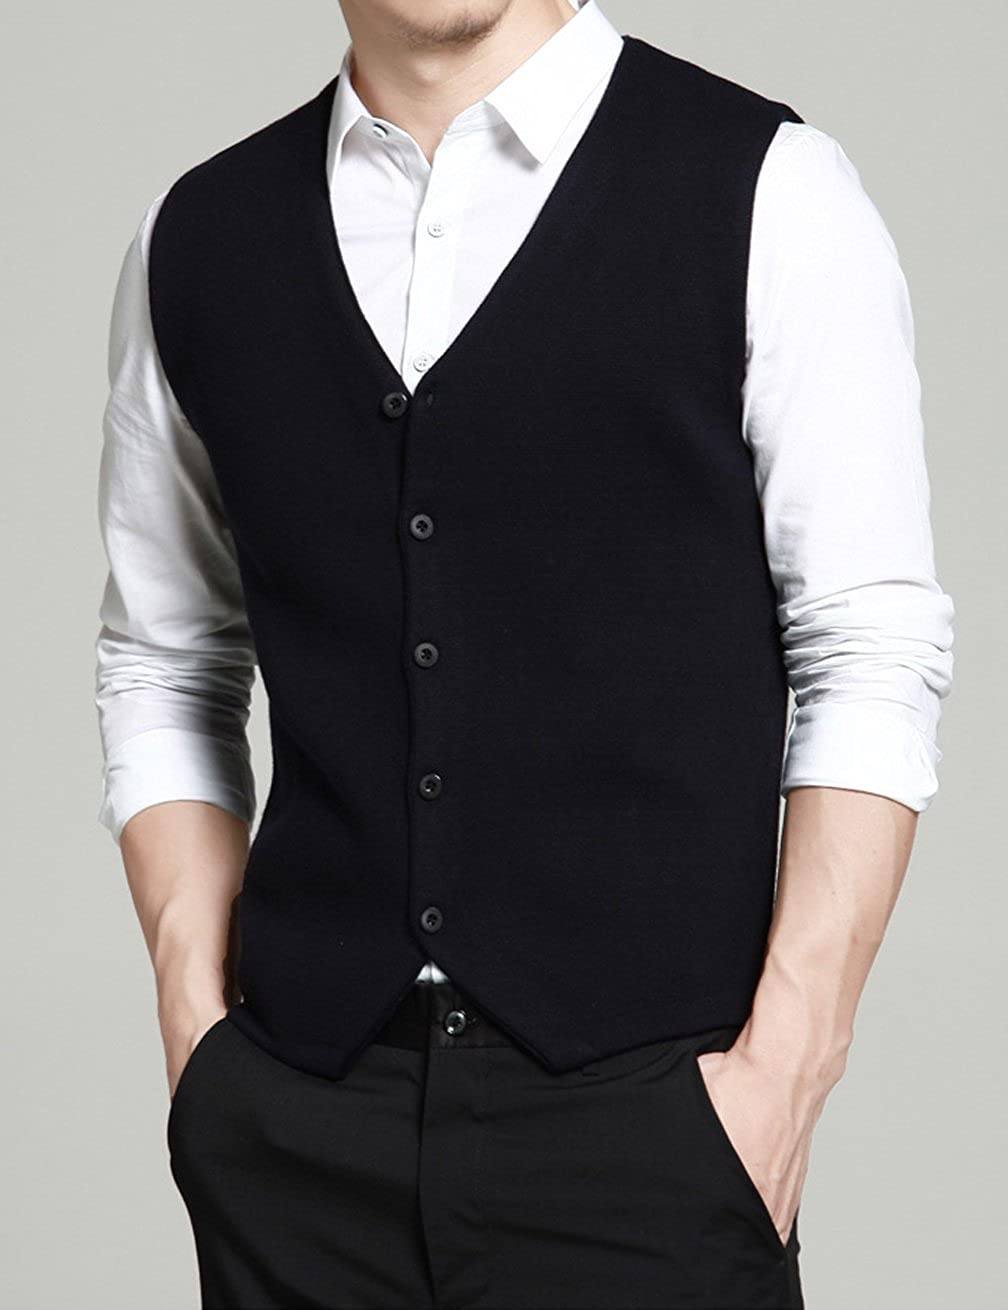 Gameyly Mens Slim-Fit Solid Knit Sweater Vest Sleeveless Tank Gameyly-100612-M-Black